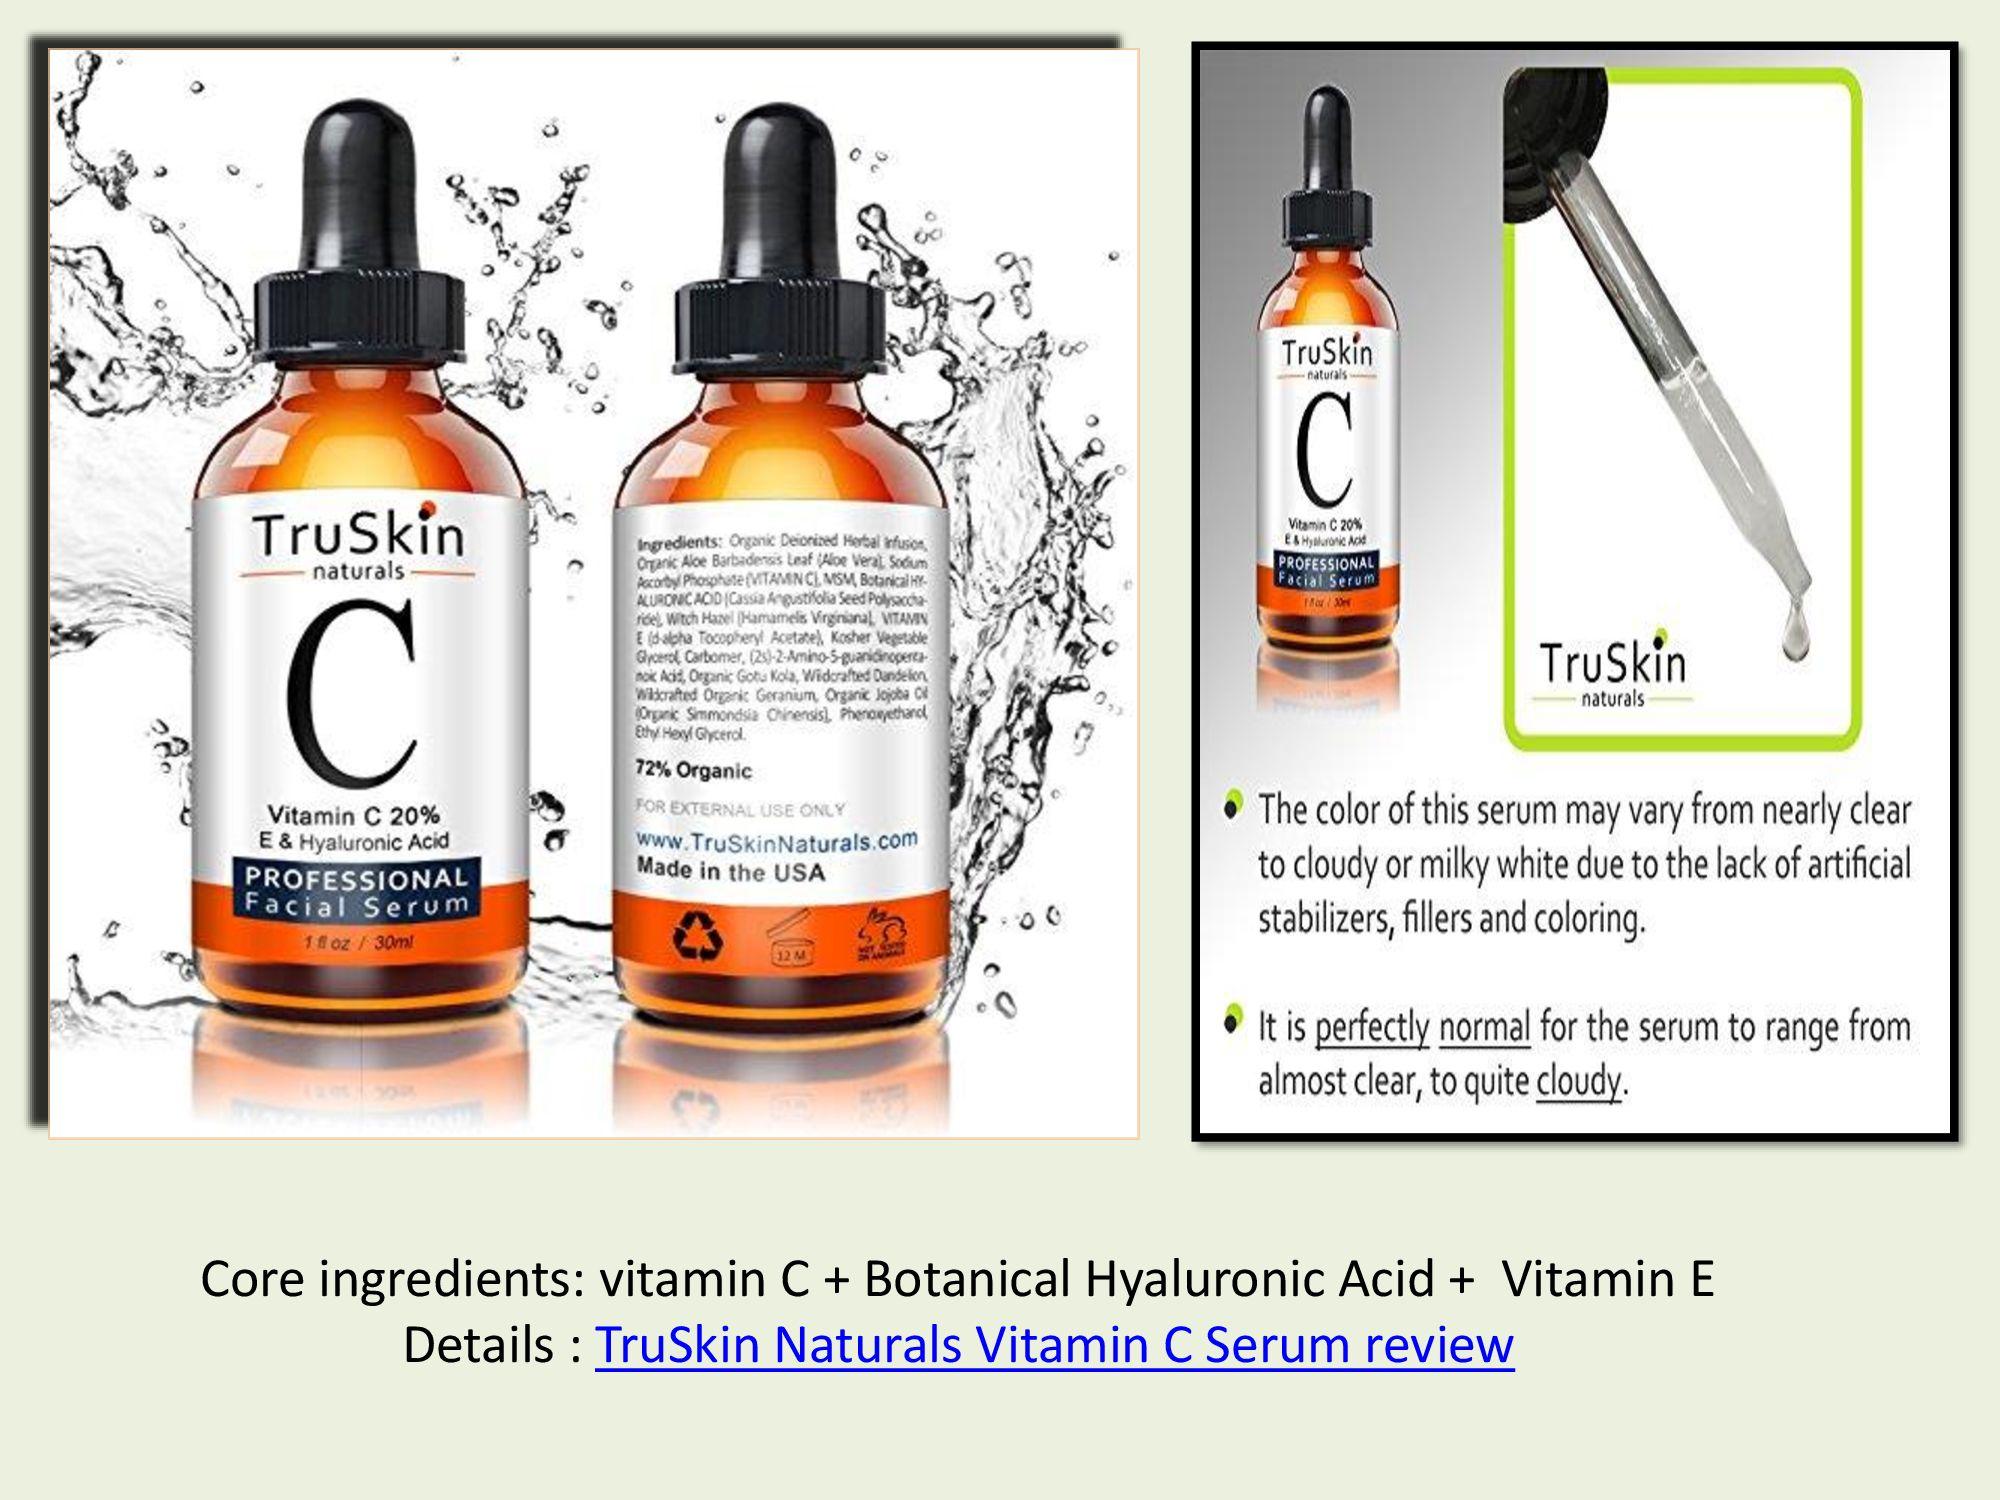 Truskin naturals vitamin c serum review 2018 Impressive